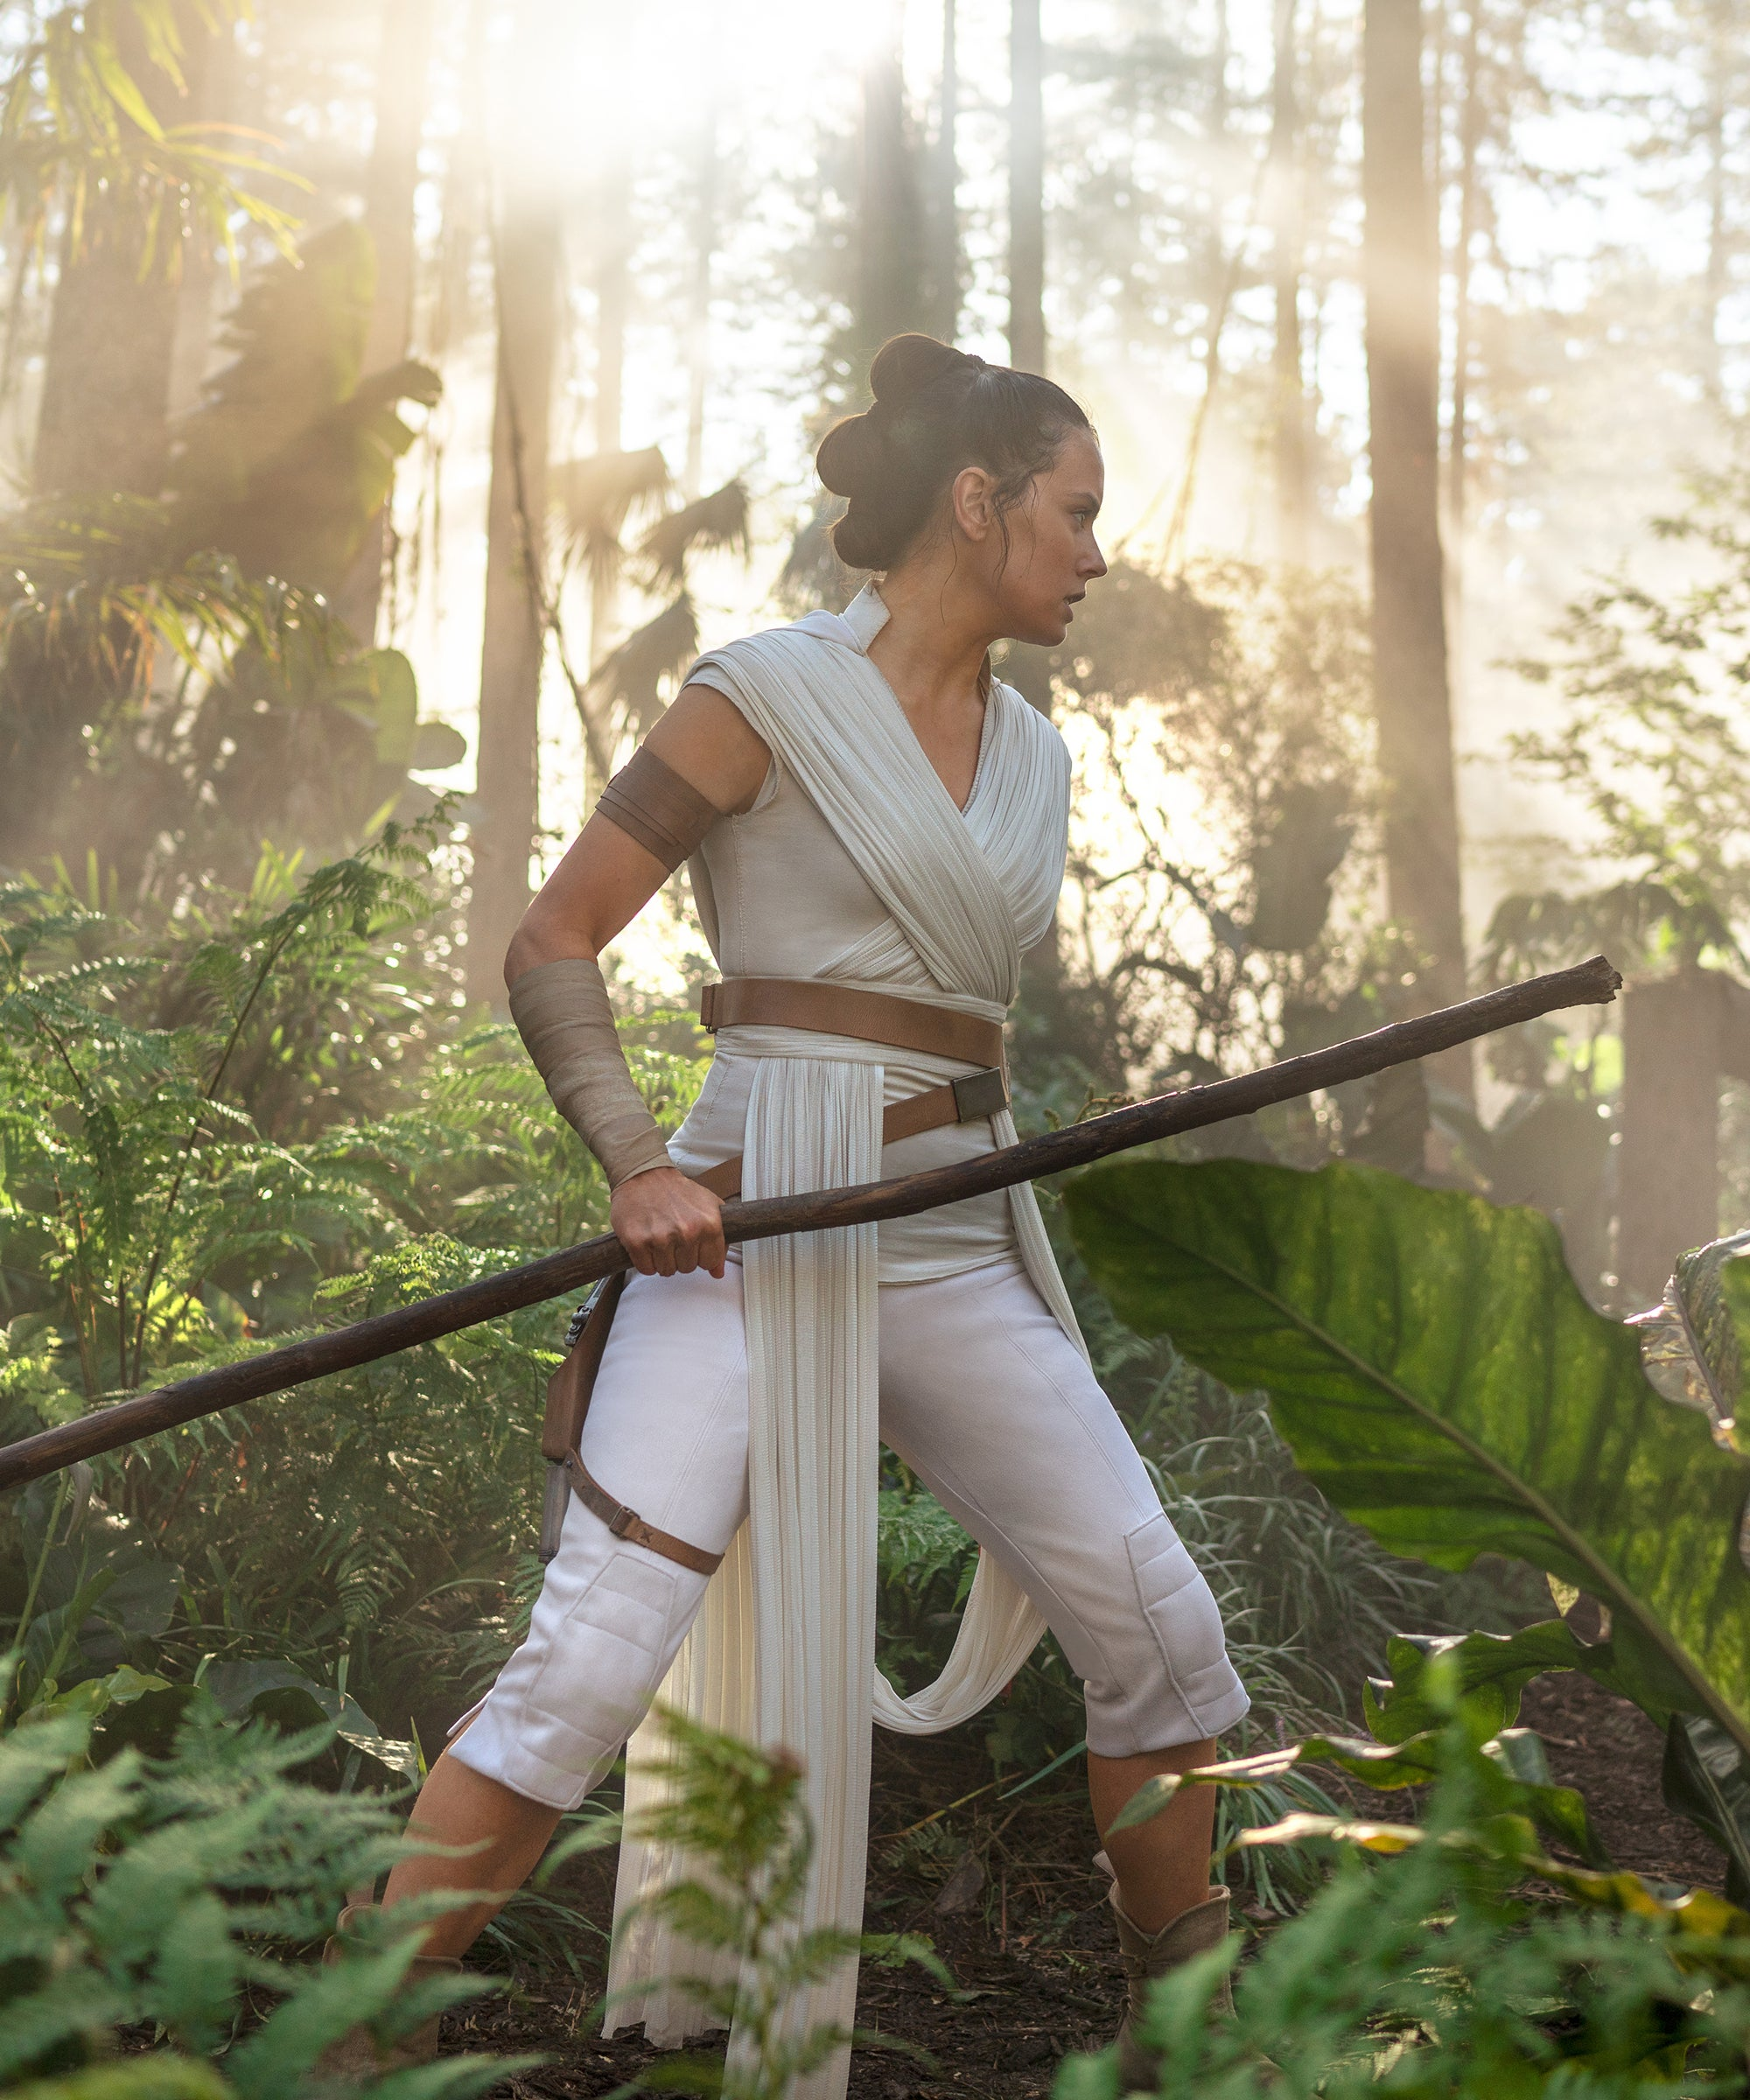 The Rise Of Skywalker Ending Is Frustrating But Works